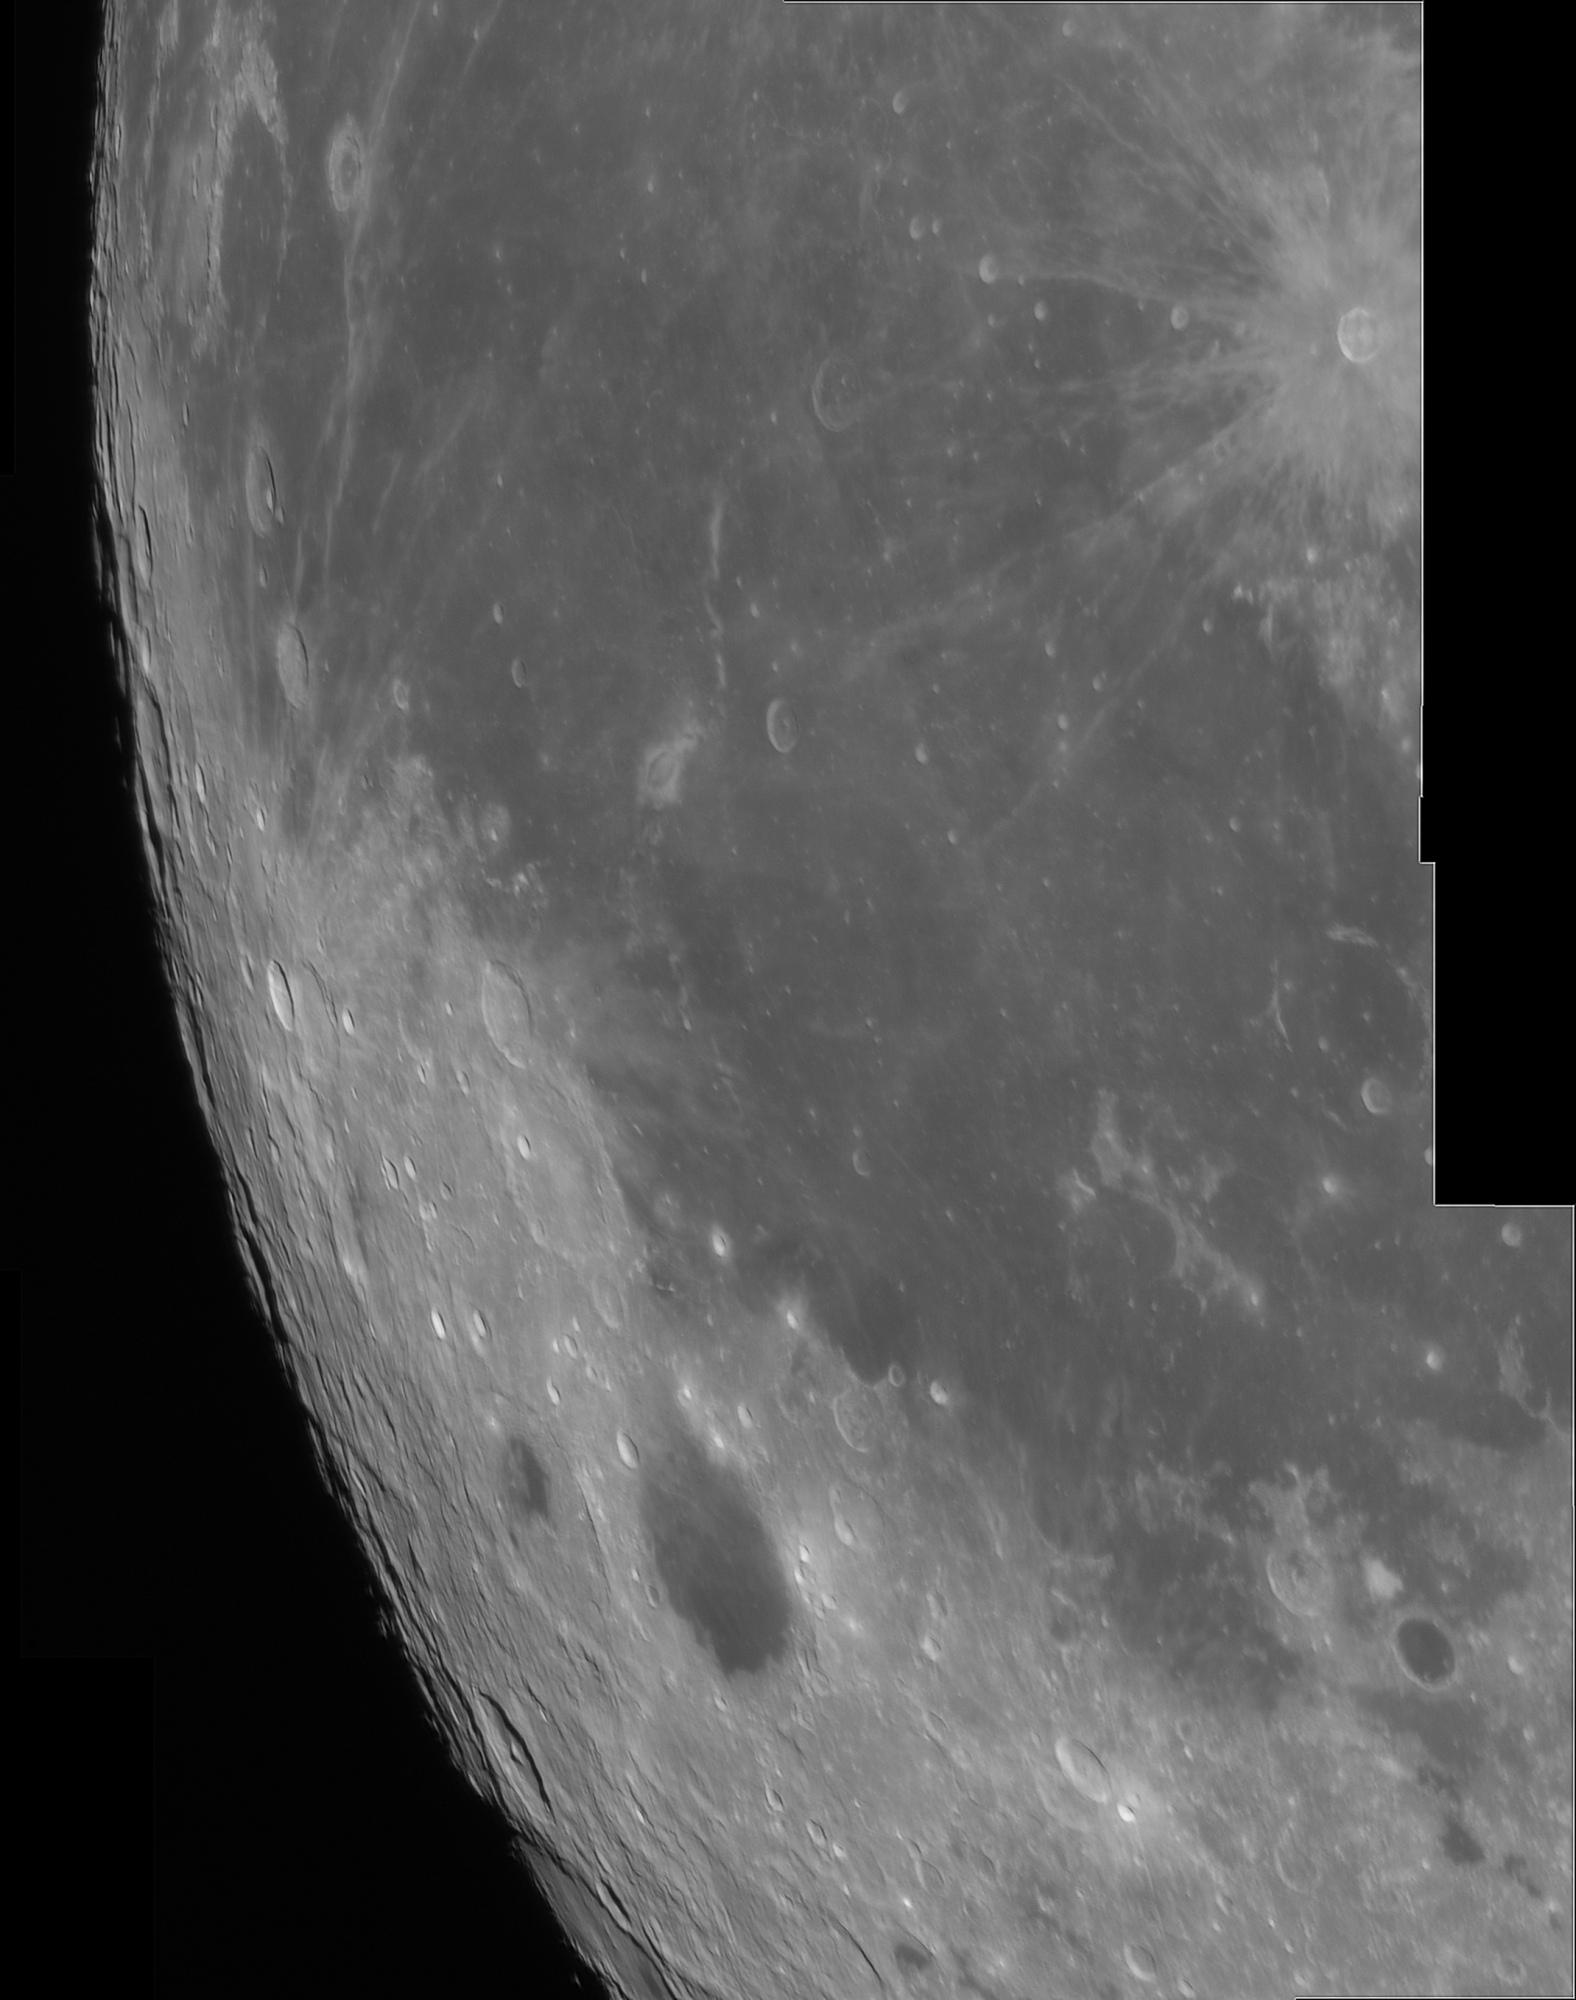 2021-02-26-2119_0-Moon_AS_P25_lapl6_ap2697_stitch.thumb.jpg.a41c74ca9959e2f1e8824254489e832c.jpg